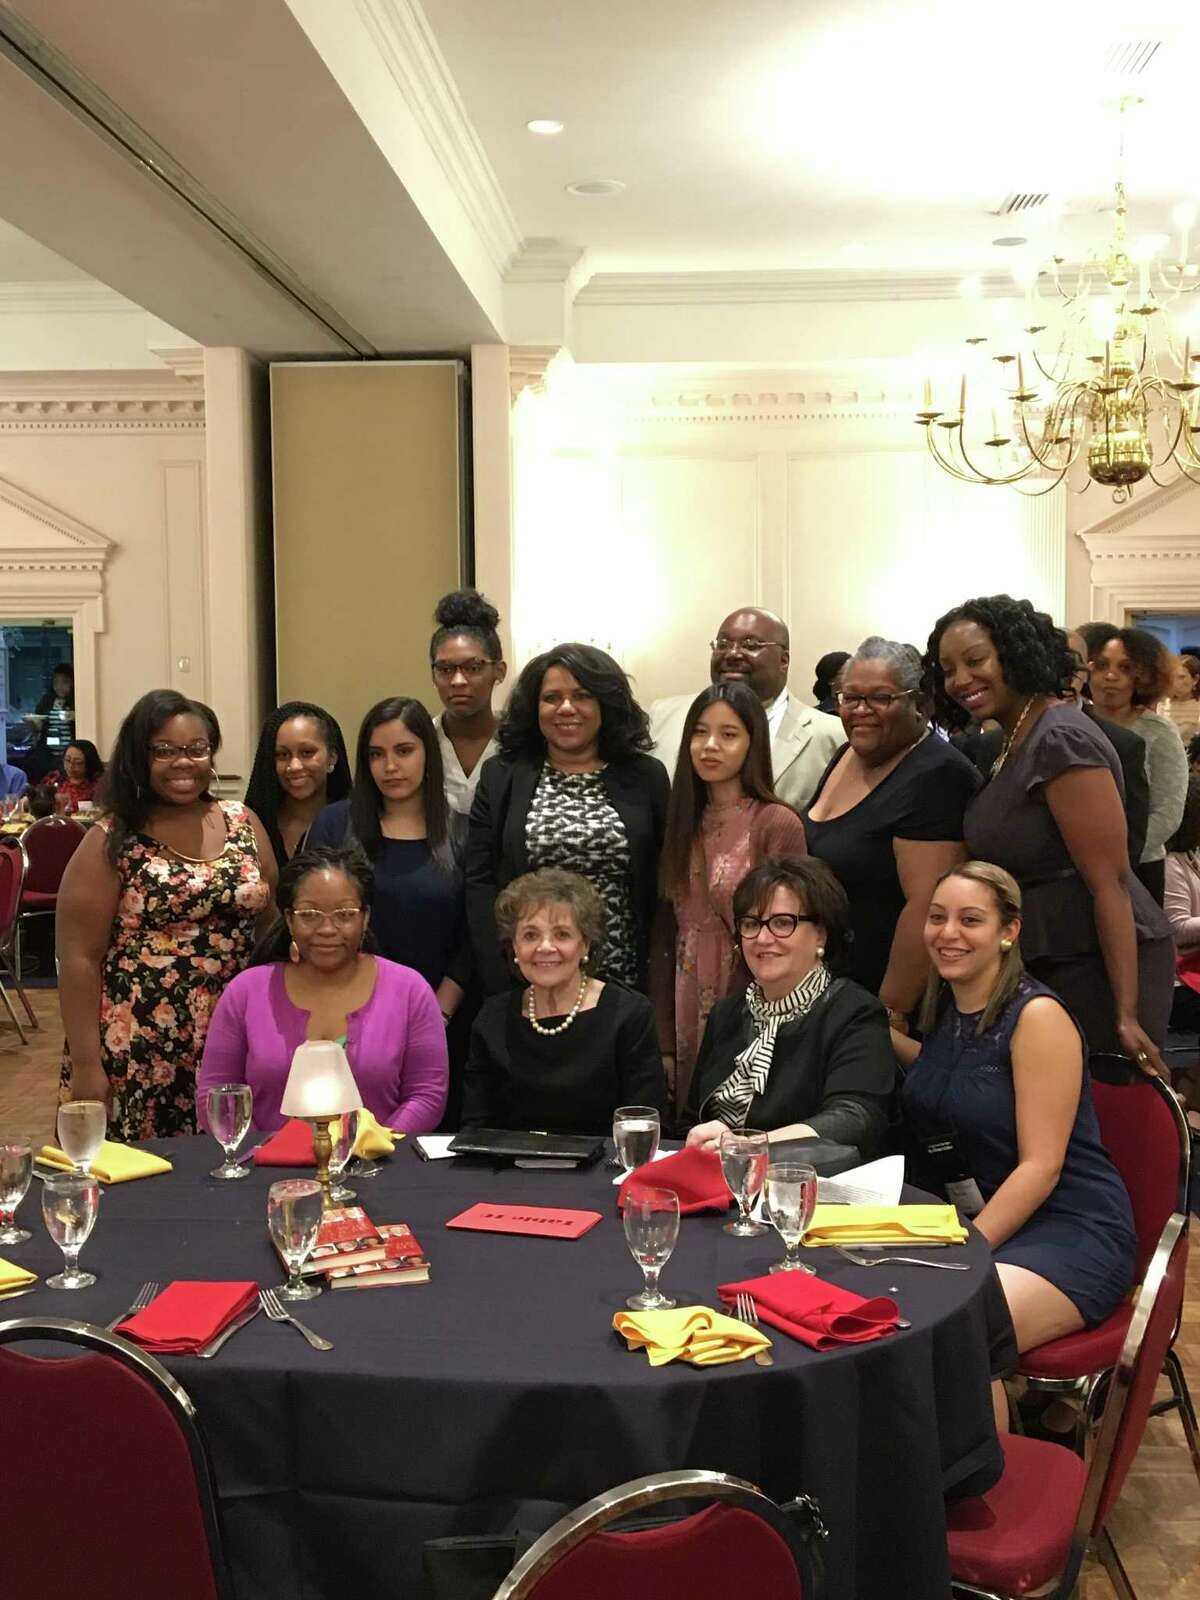 Matilda Raffa Cuomo receives the Liberty Partnerships Program Lifetime Achievement Award Friday night in Colonie. (Photo provided)